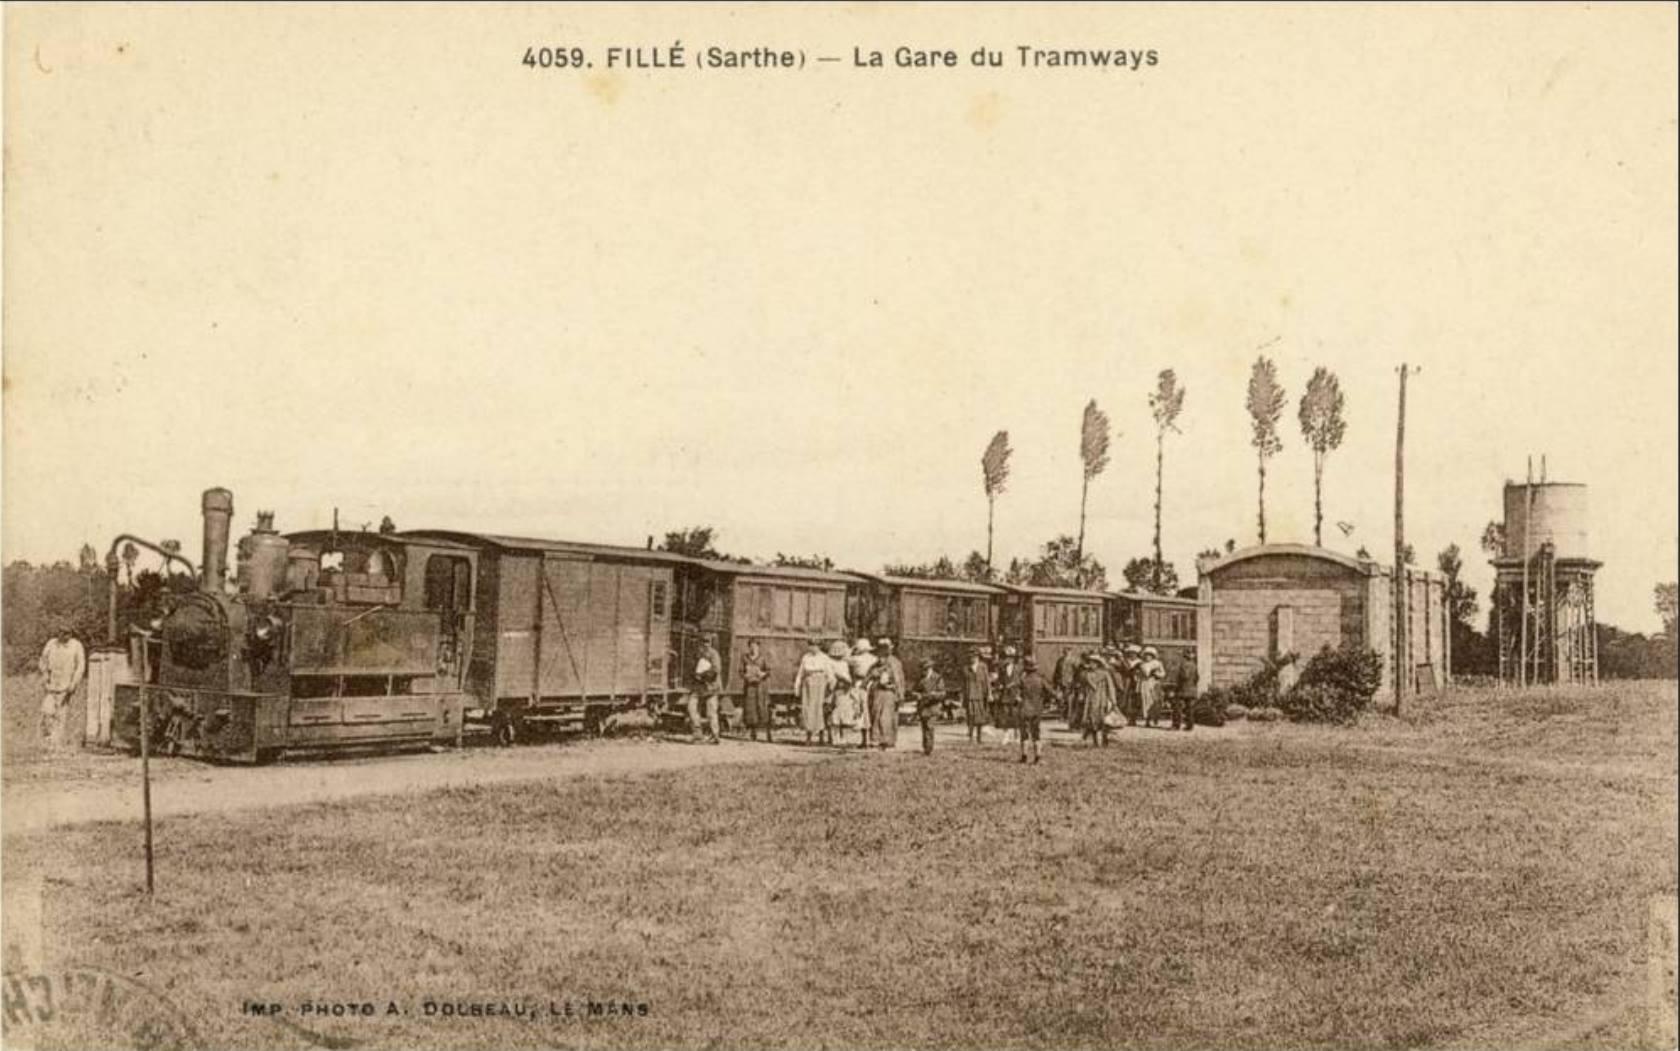 Fillé - La Gare du Tramways